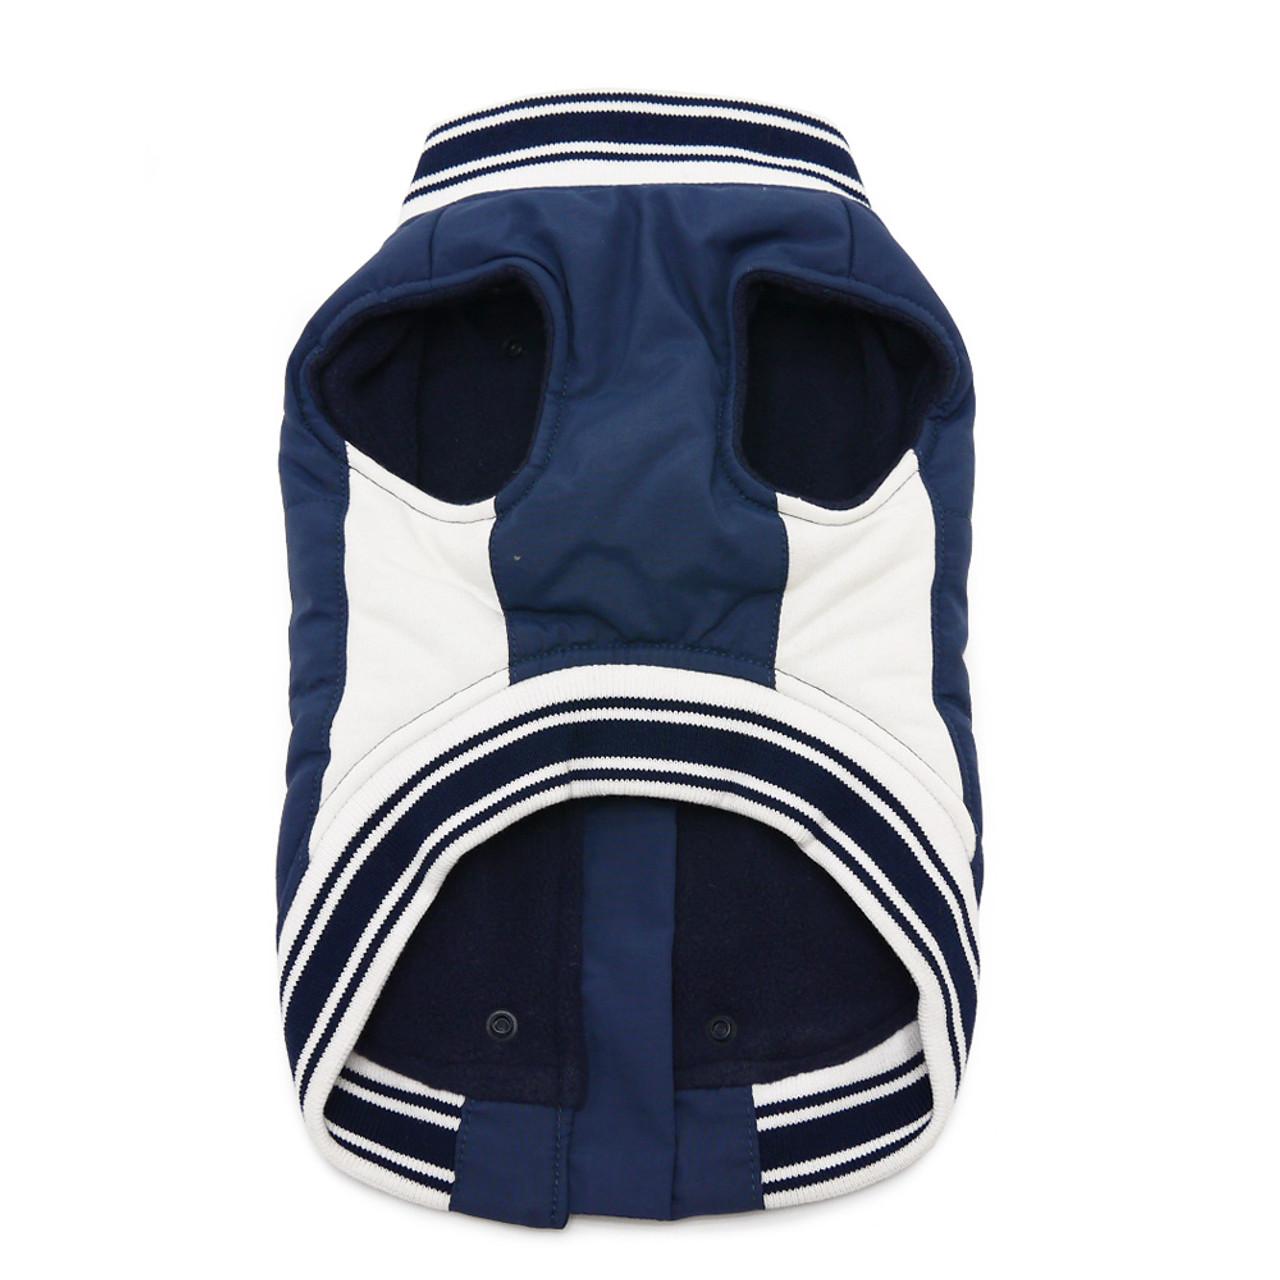 Dogo Varsity Runner Coat with Built In Harness